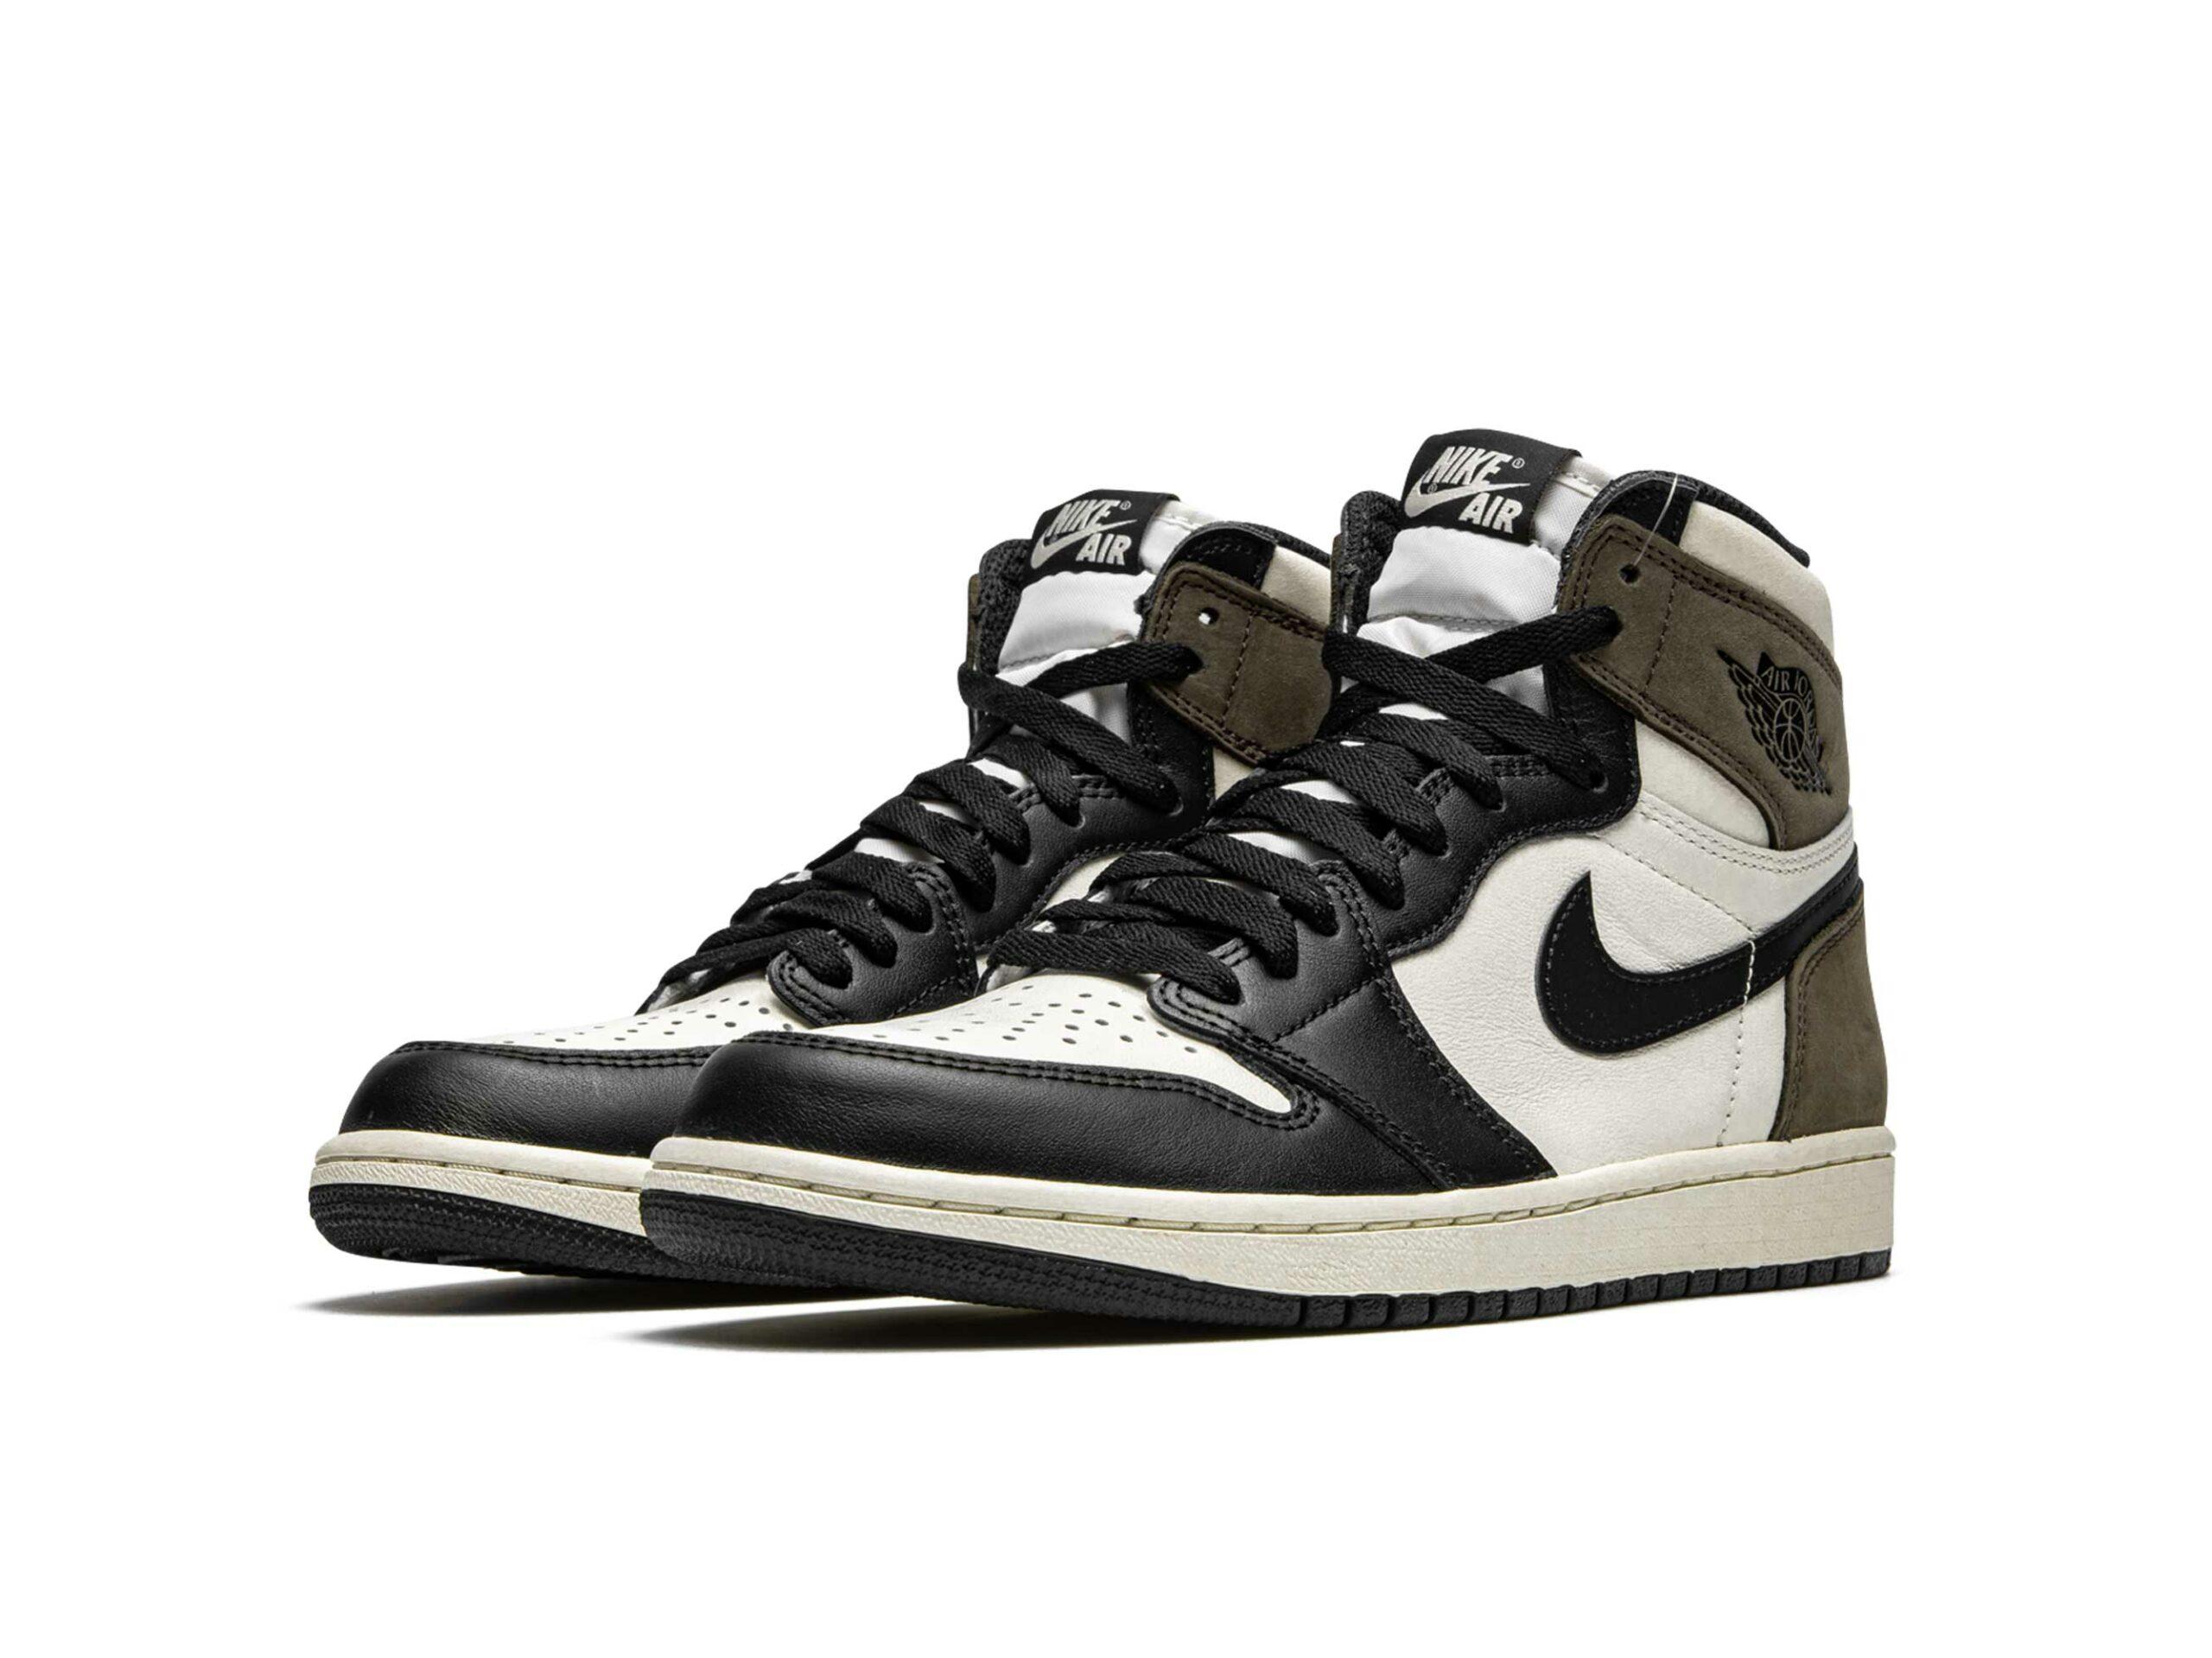 nike air Jordan 1 retro jogh og dark mocha 555088_105 купить